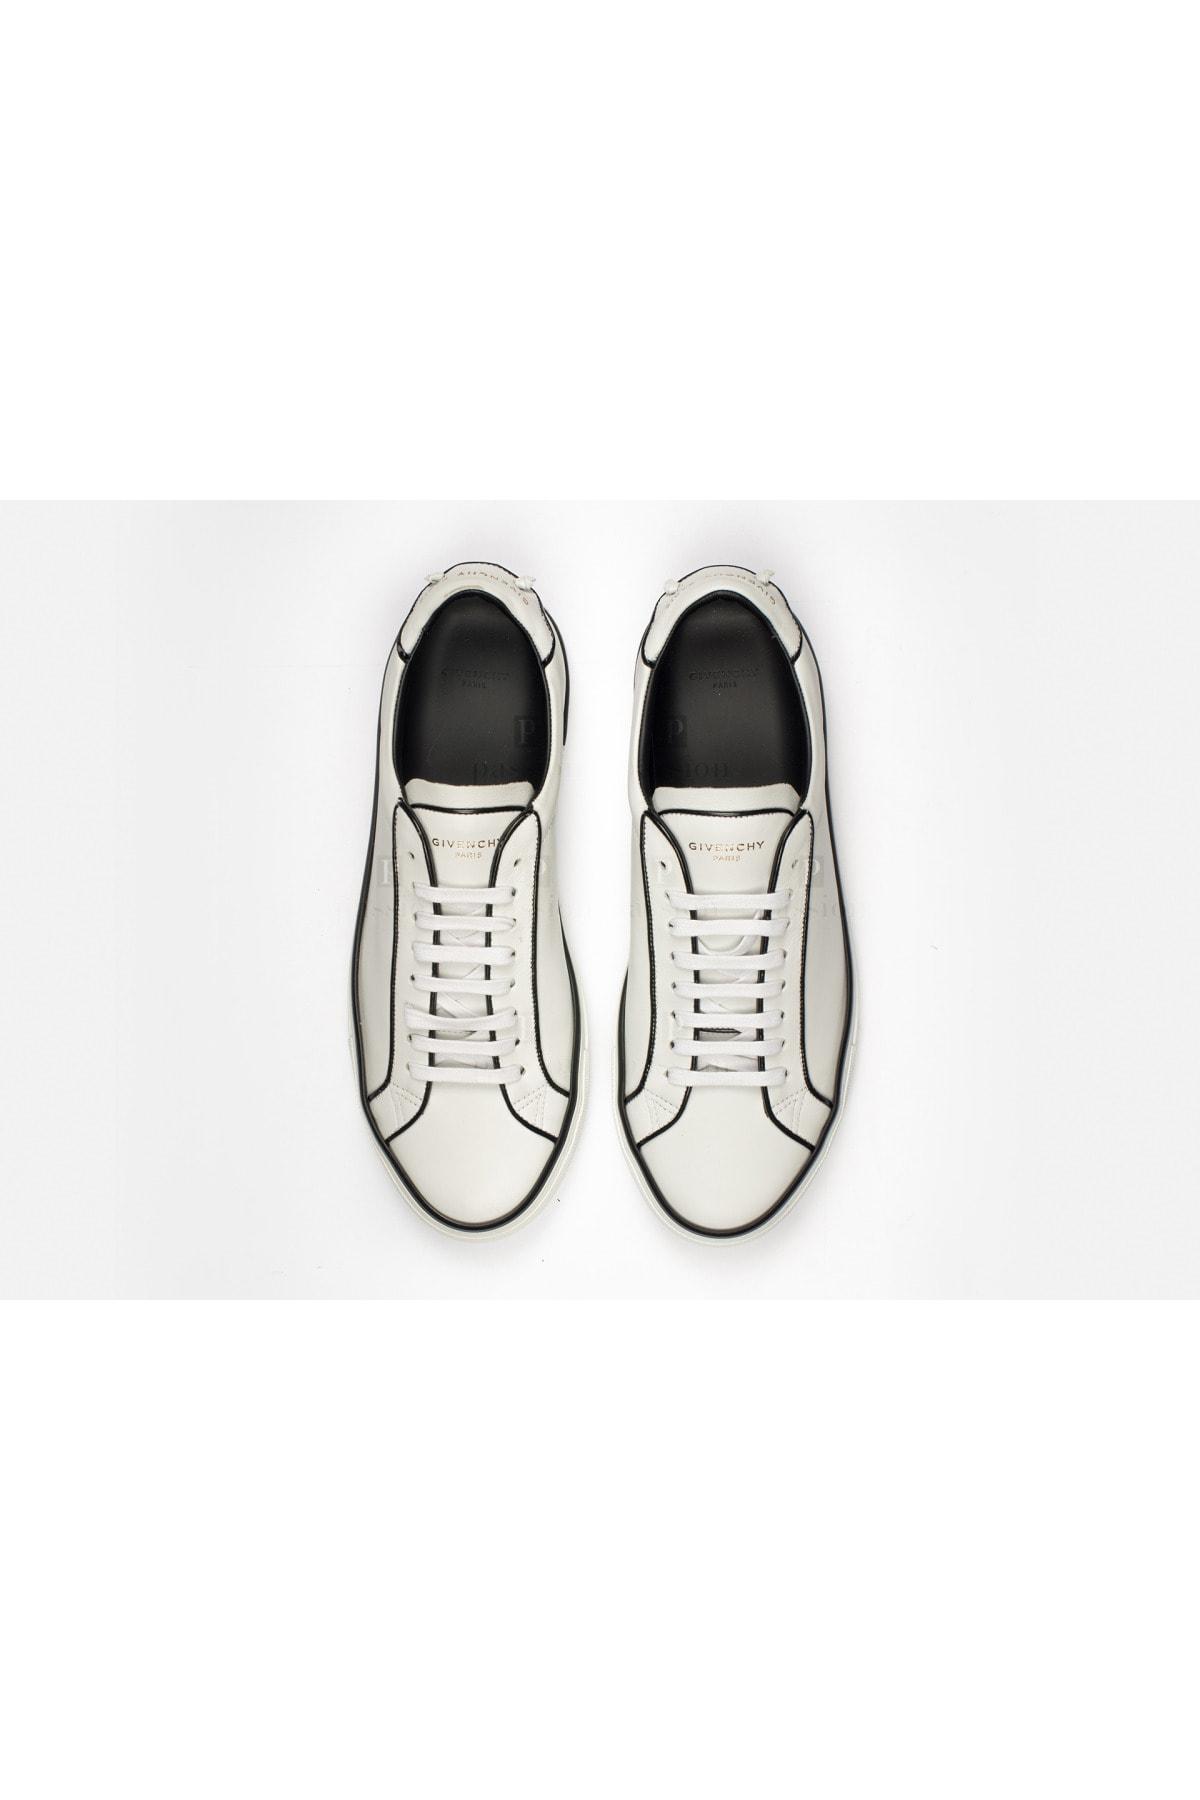 Givenchy Erkek Beyaz Sneakers 2